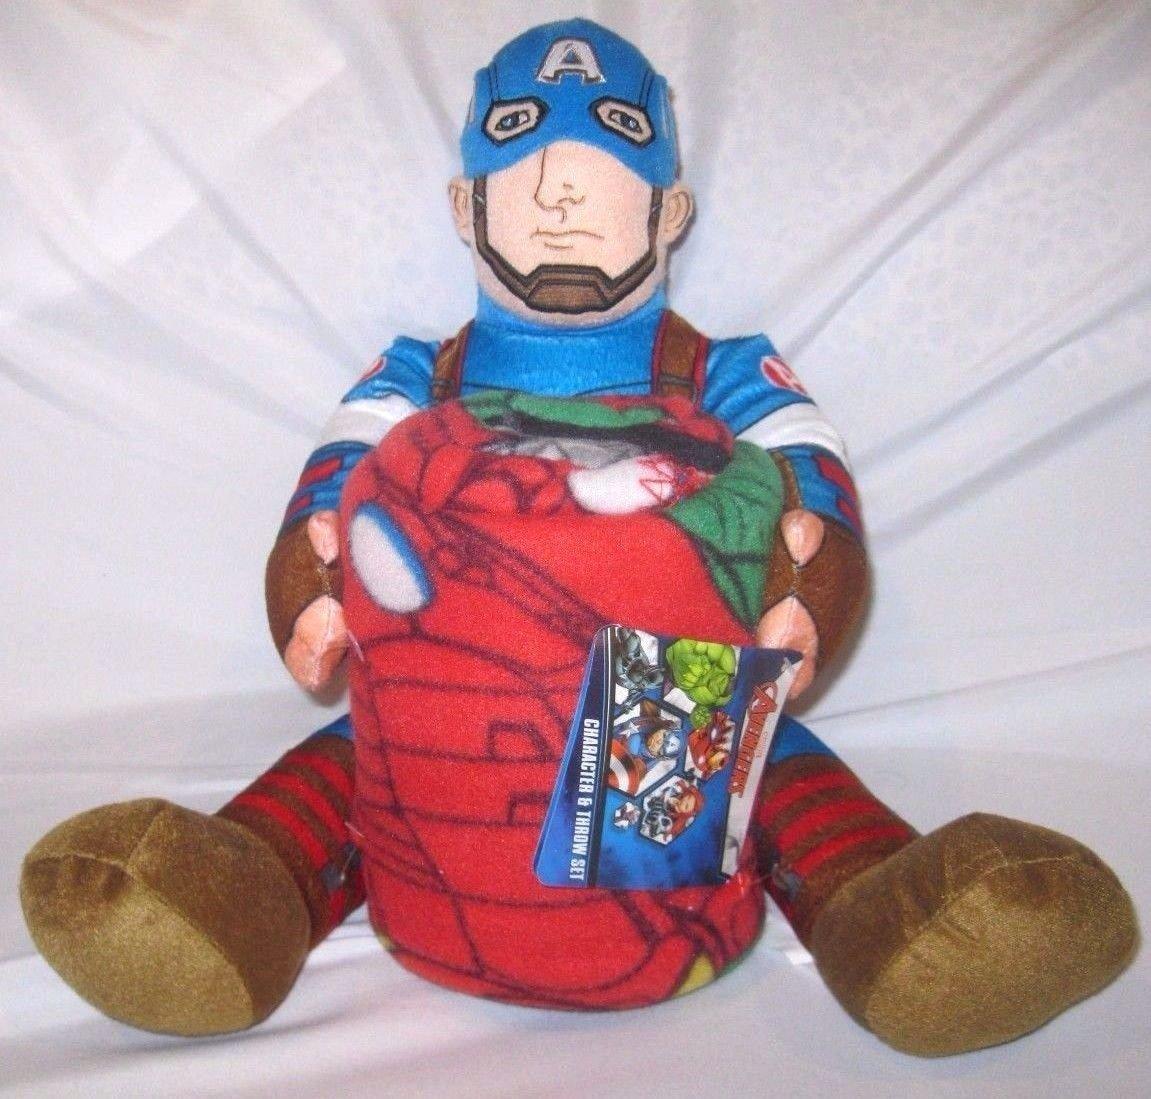 "Granny's Best Deals (C) Marvel 18"" Captain America Plush + 40"" x 50"" Avengers Throw-Licensed Product-New!"